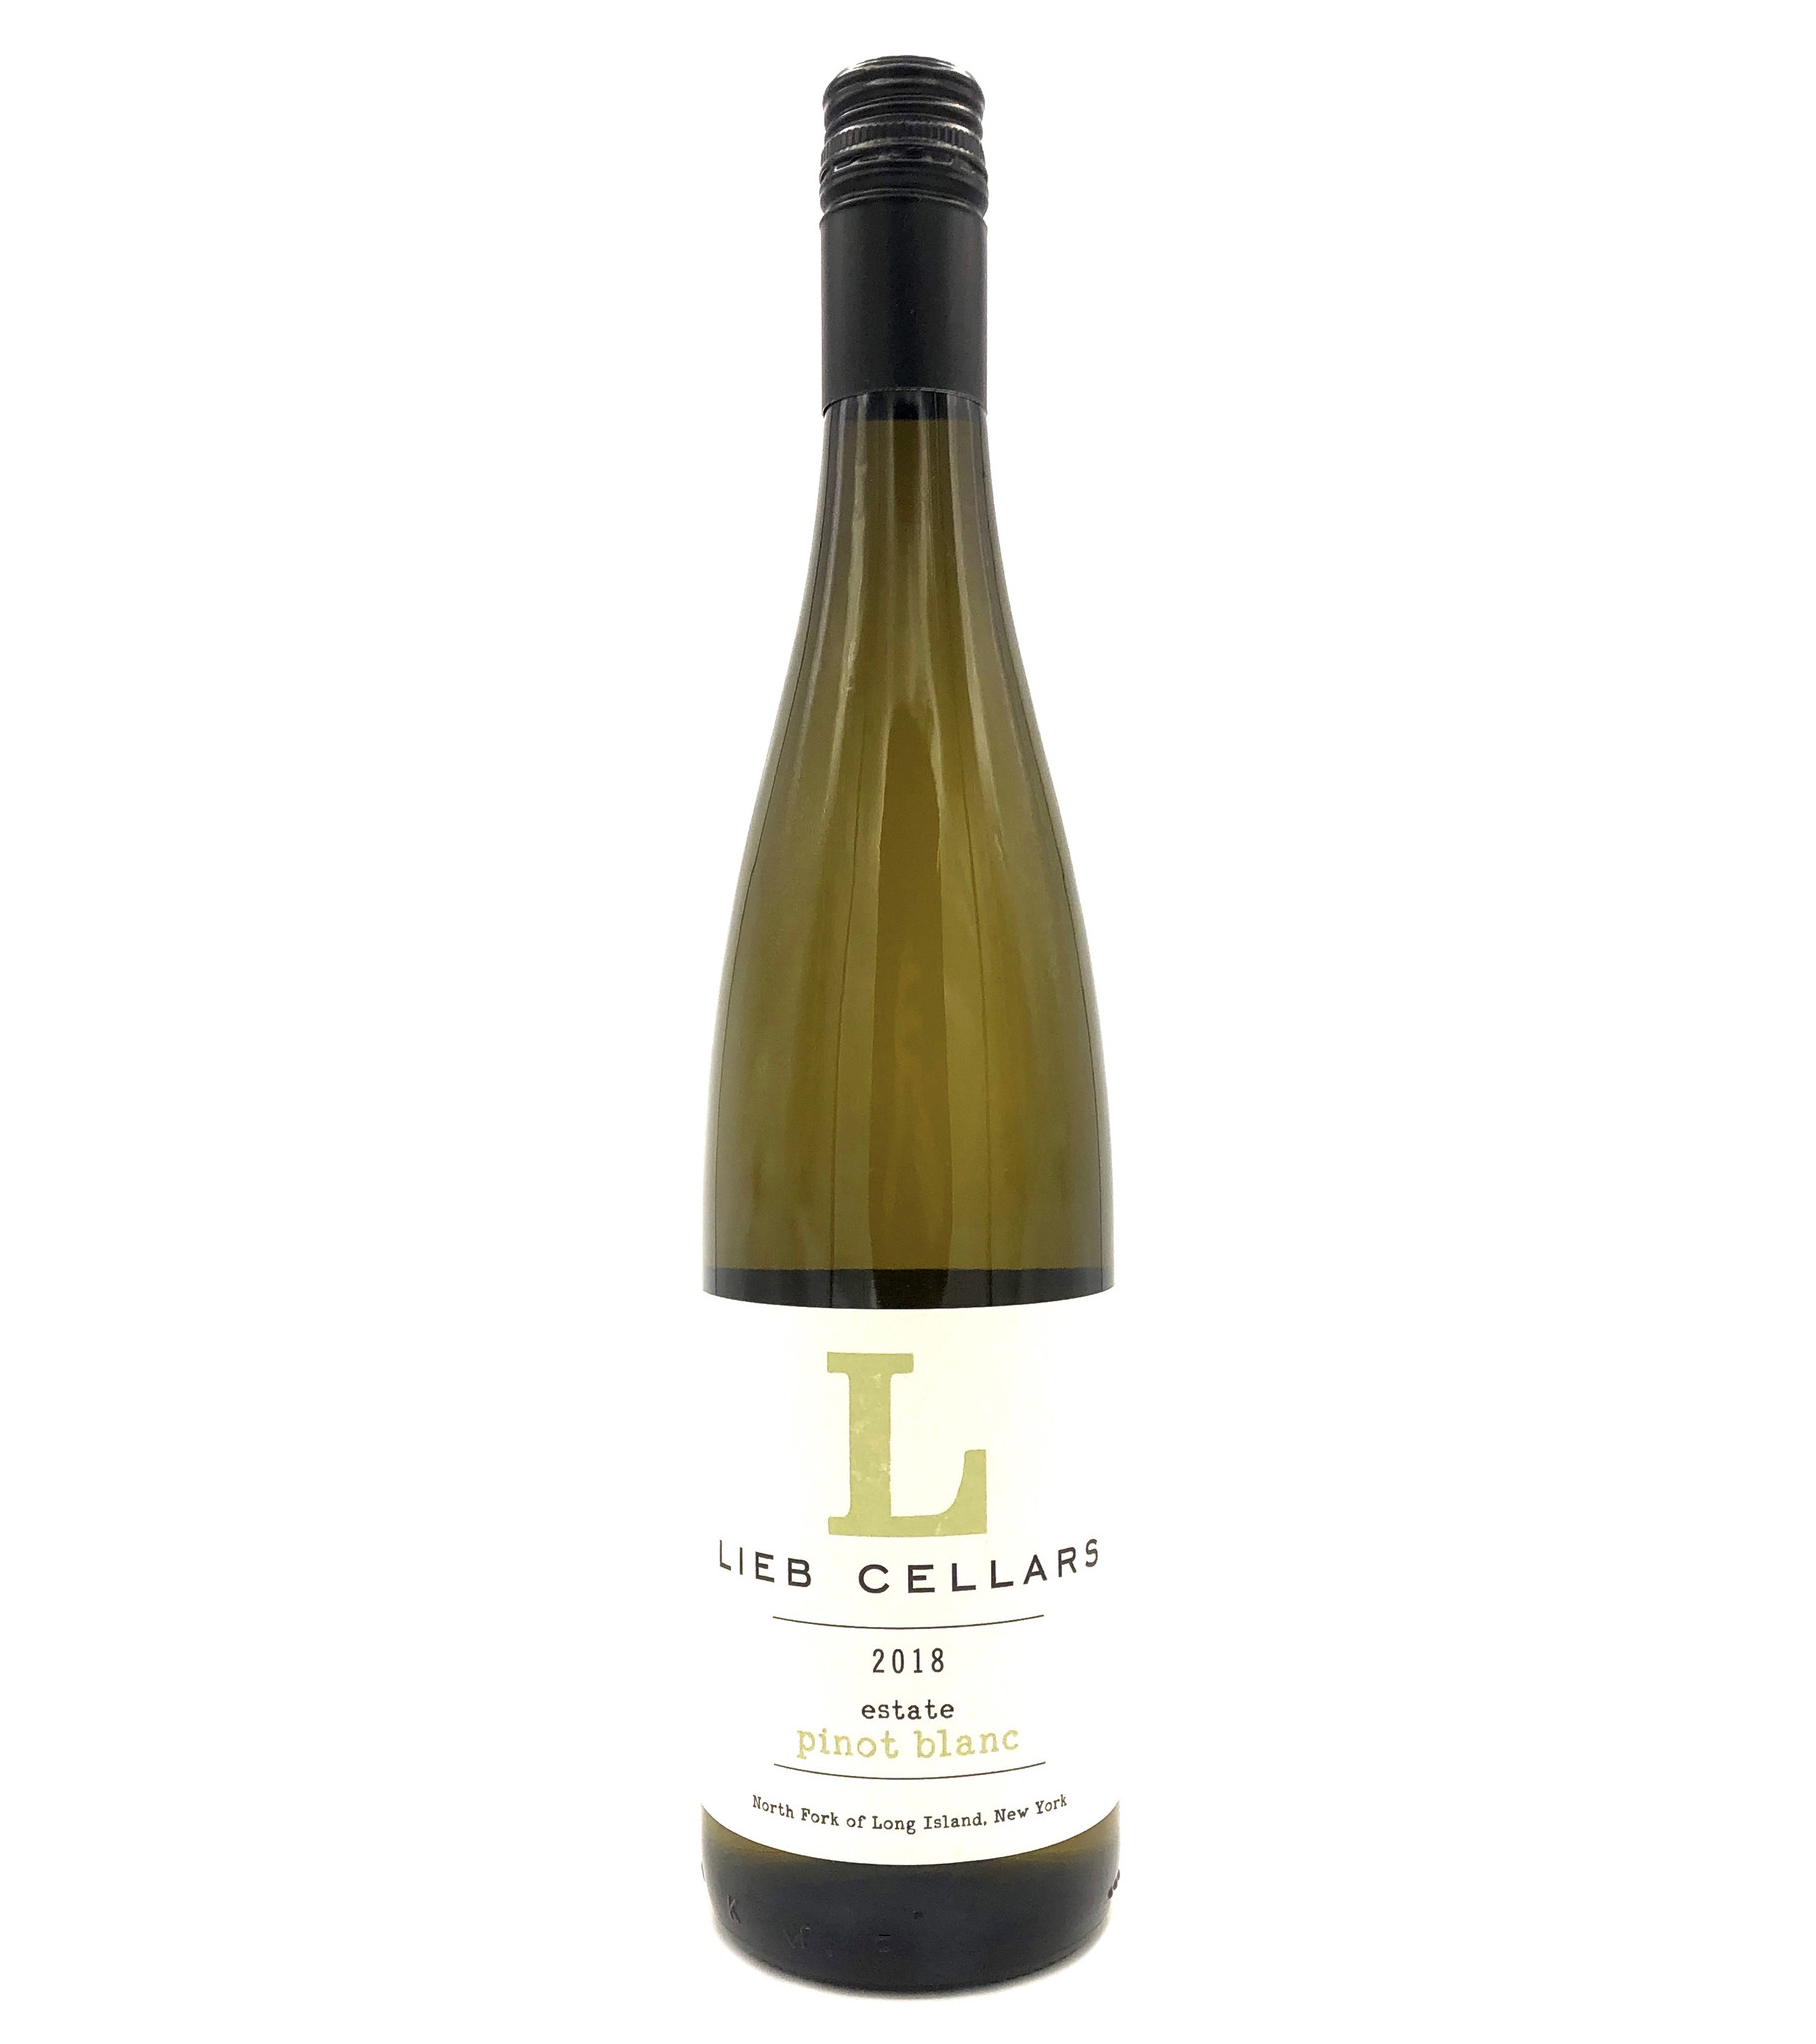 Pinot Blanc 2018 Lieb Cellars